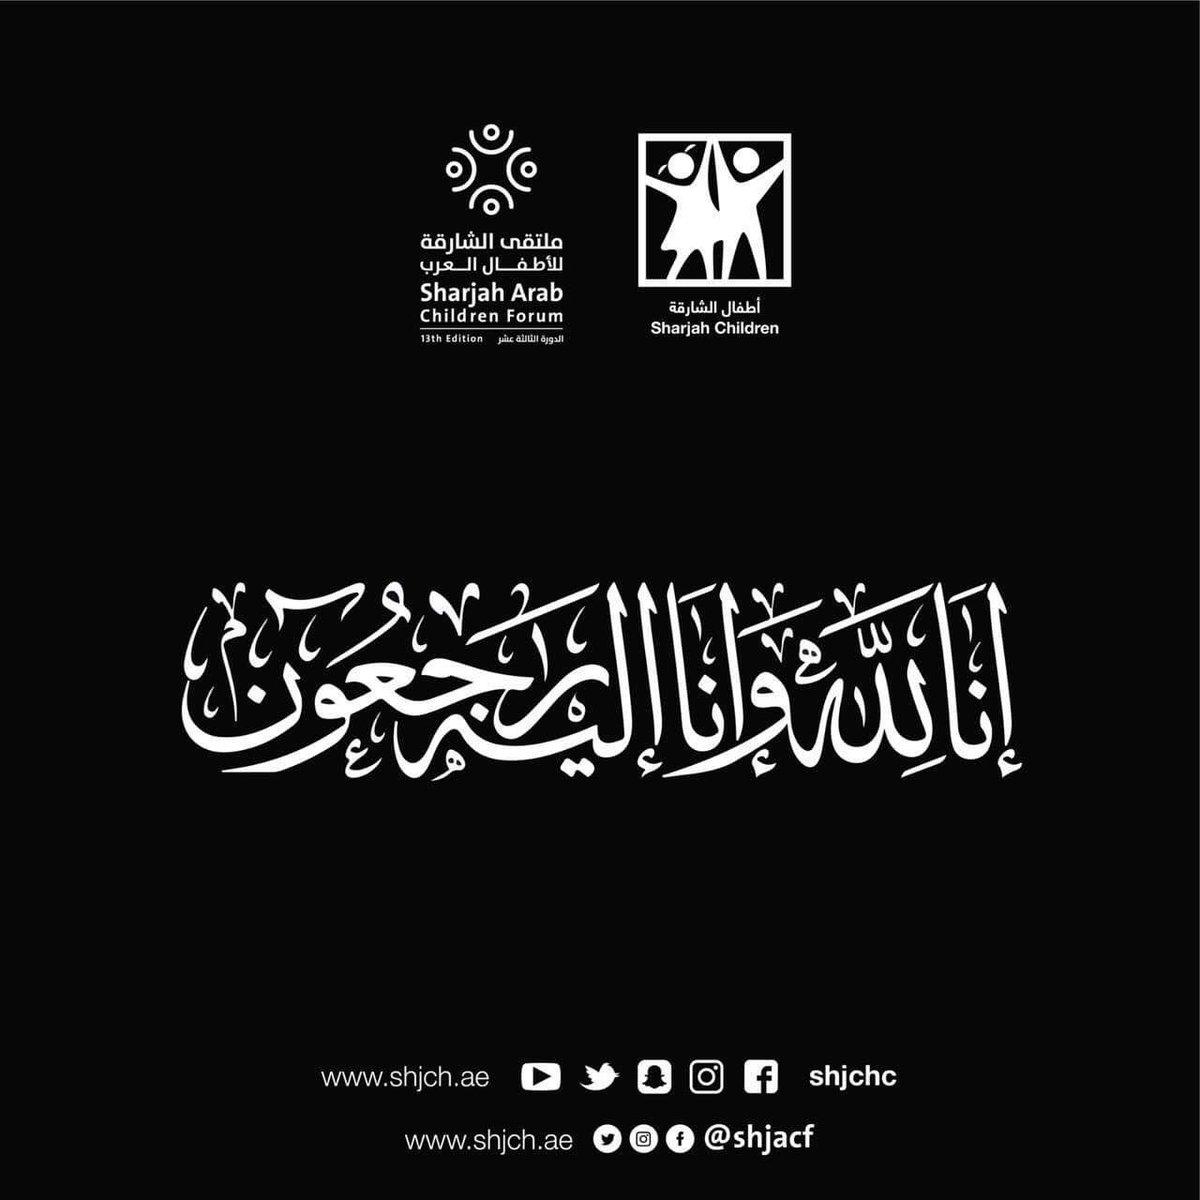 #SharjahChildren  deeply mourns the passing of Sheikh Khalid bin Sultan bin Mohammad Al Qasimi, son of His Highness Sheikh Dr.Sultan bin Mohammad Al Qasimi, Member of the Supreme Council and Ruler of Sharjah, on July 1,2019 (Shawwal 28,1440 Hijri) in the UK @rqsharjah  #rubuqarn https://t.co/OAczZLtKKf